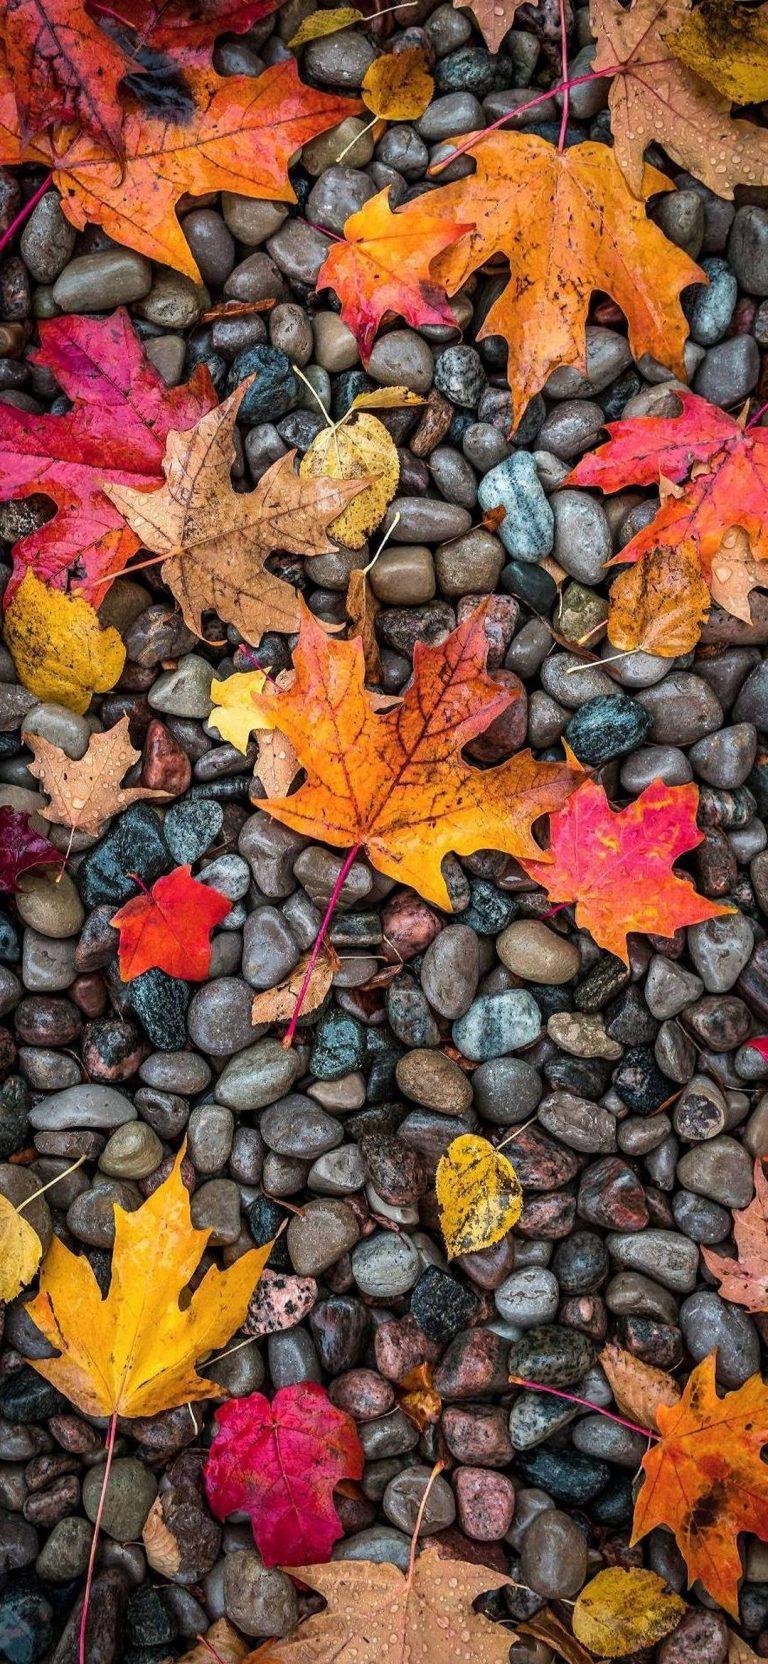 Autumn Phone Wallpaper 054 768x1664